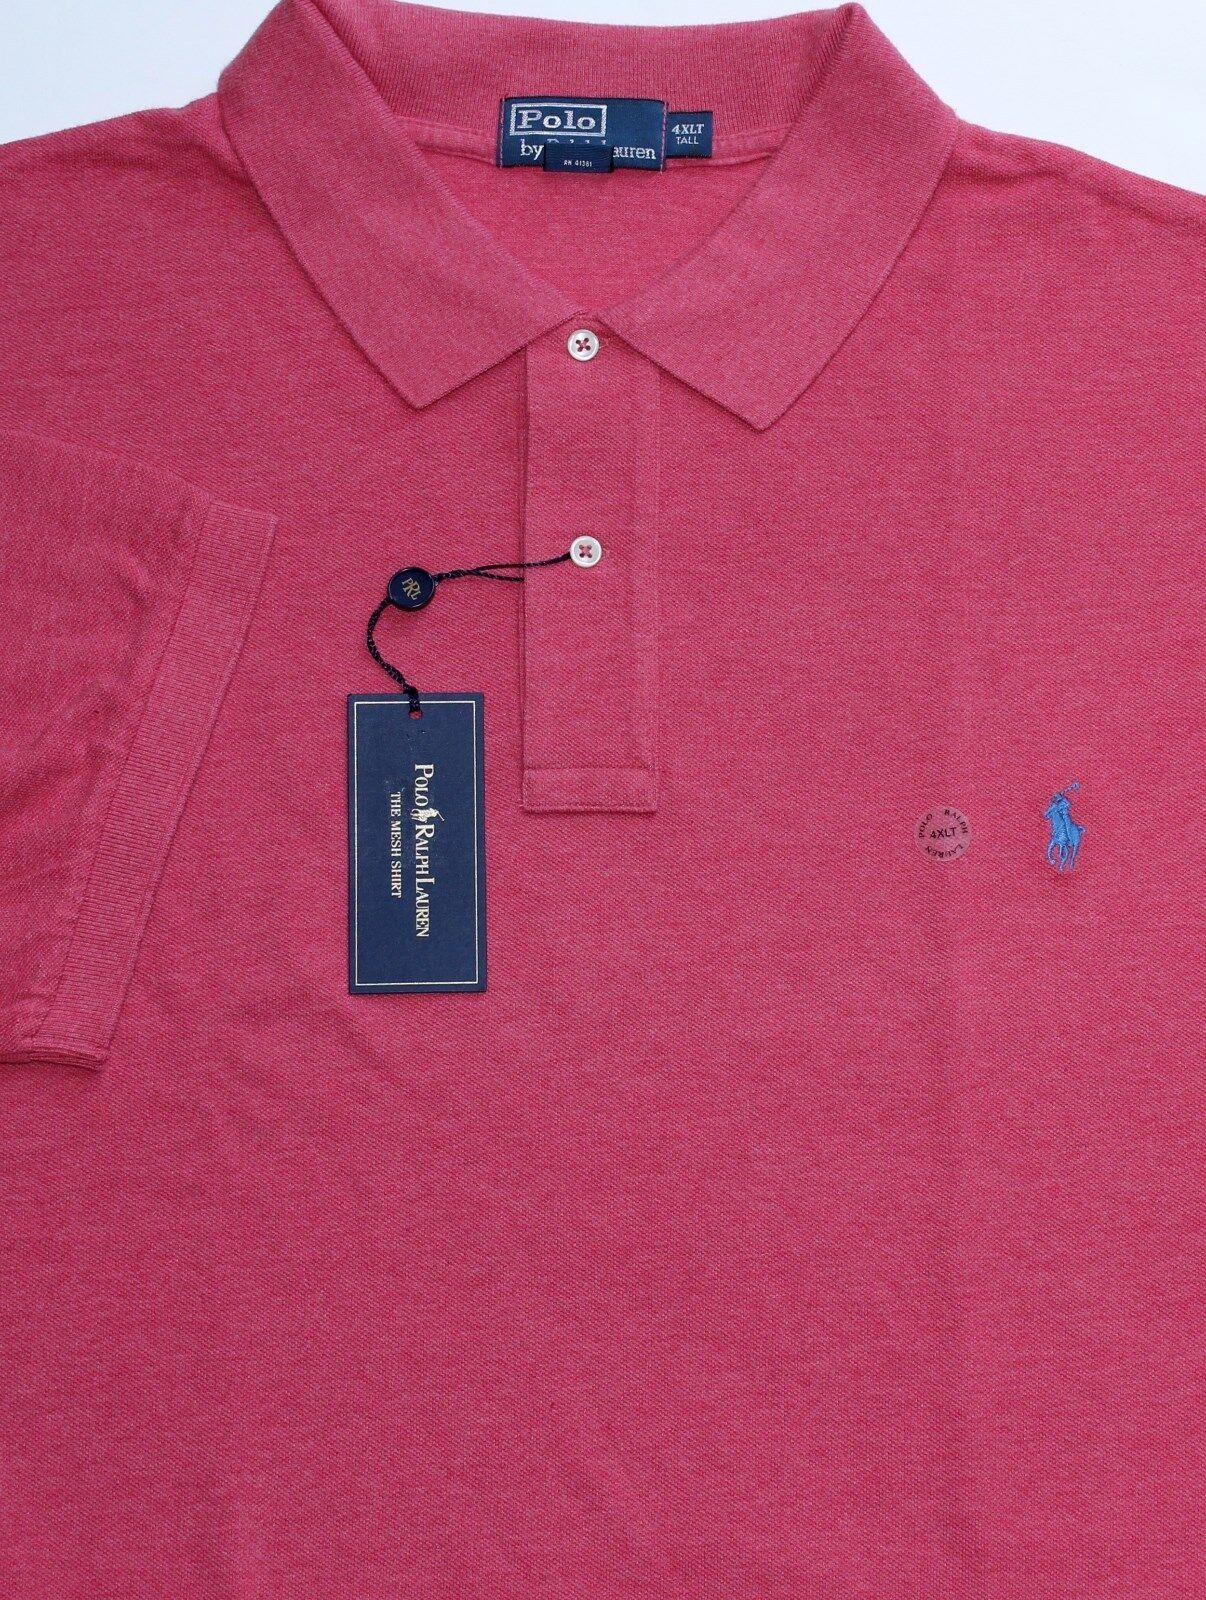 0cc54b0cb New Polo Ralph Lauren Red Heather Cotton Mesh Polo Shirt Medium ...